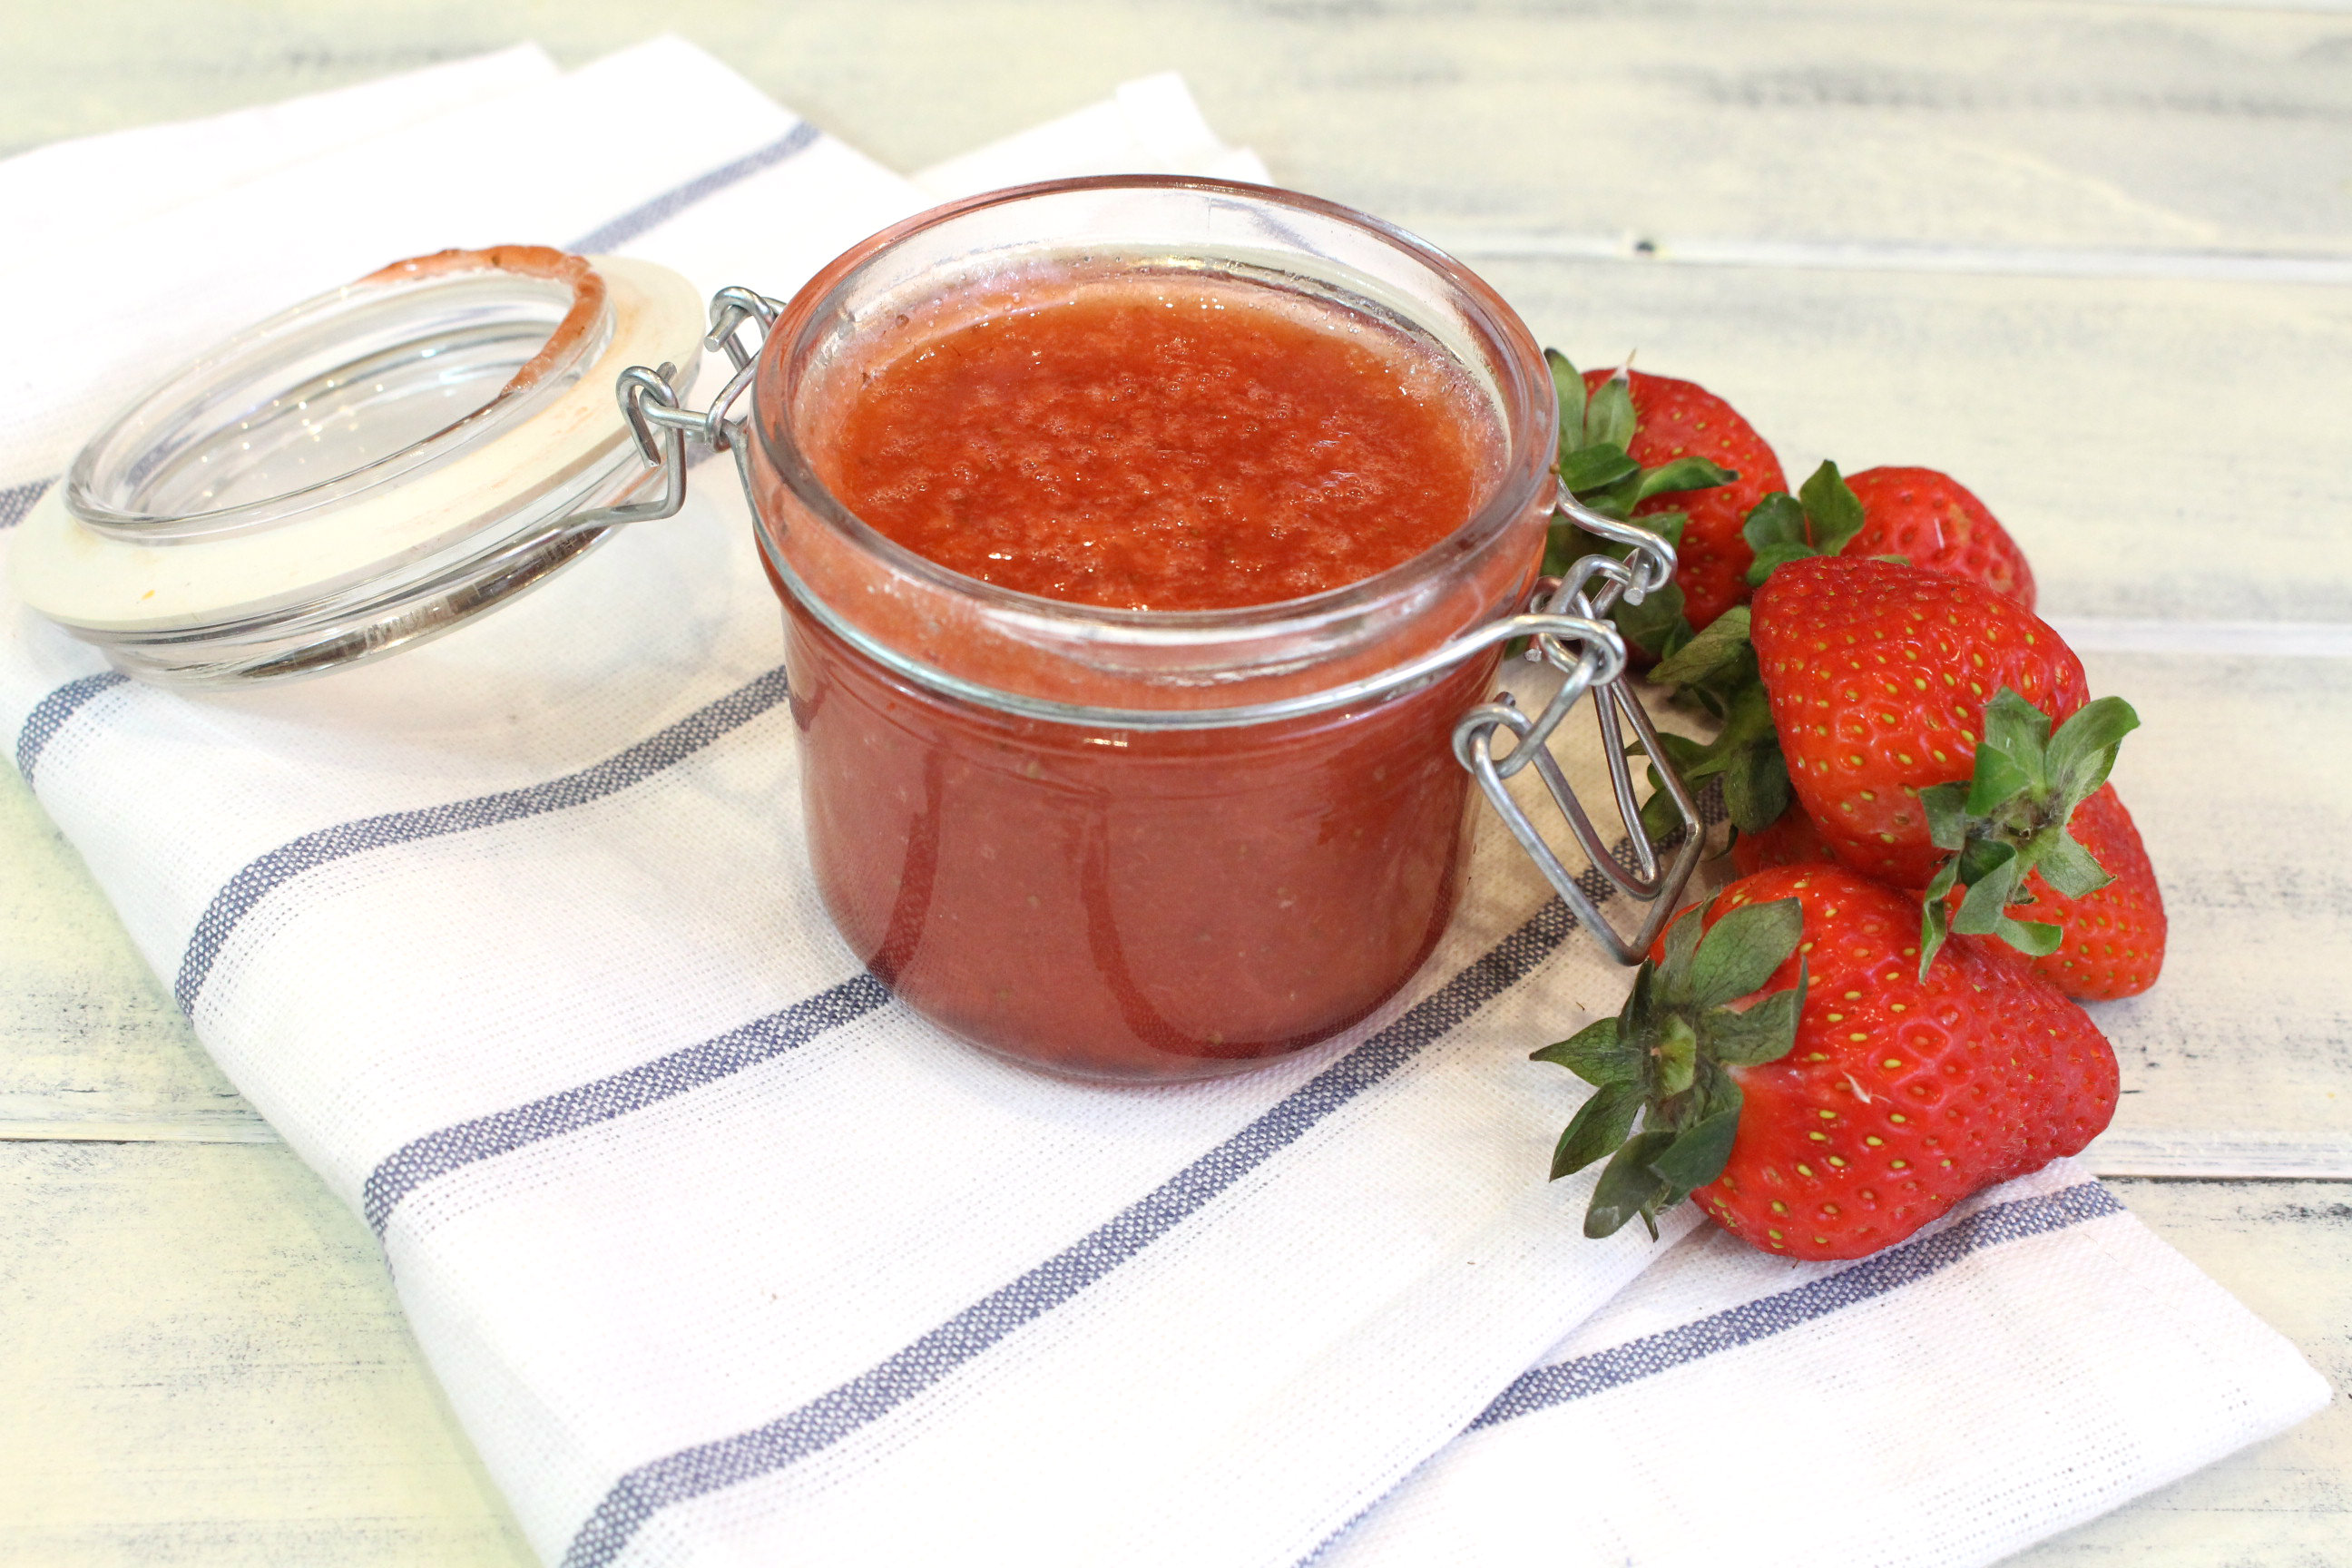 Receta de mermelada de fresas sin azúcar